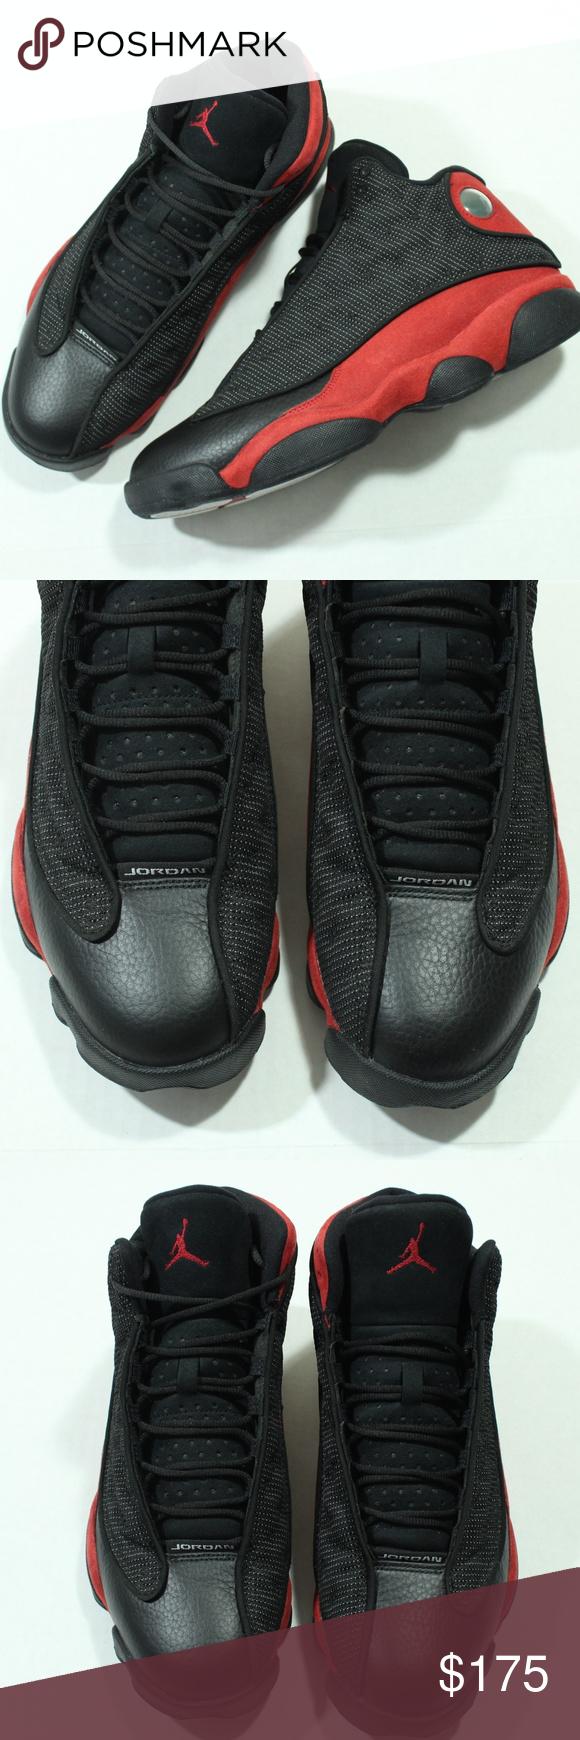 ca47d4d24e50 Nike Air Jordan 13 XIII Retro Bred Black True Red Nike Air Jordan 13 XIII  Retro